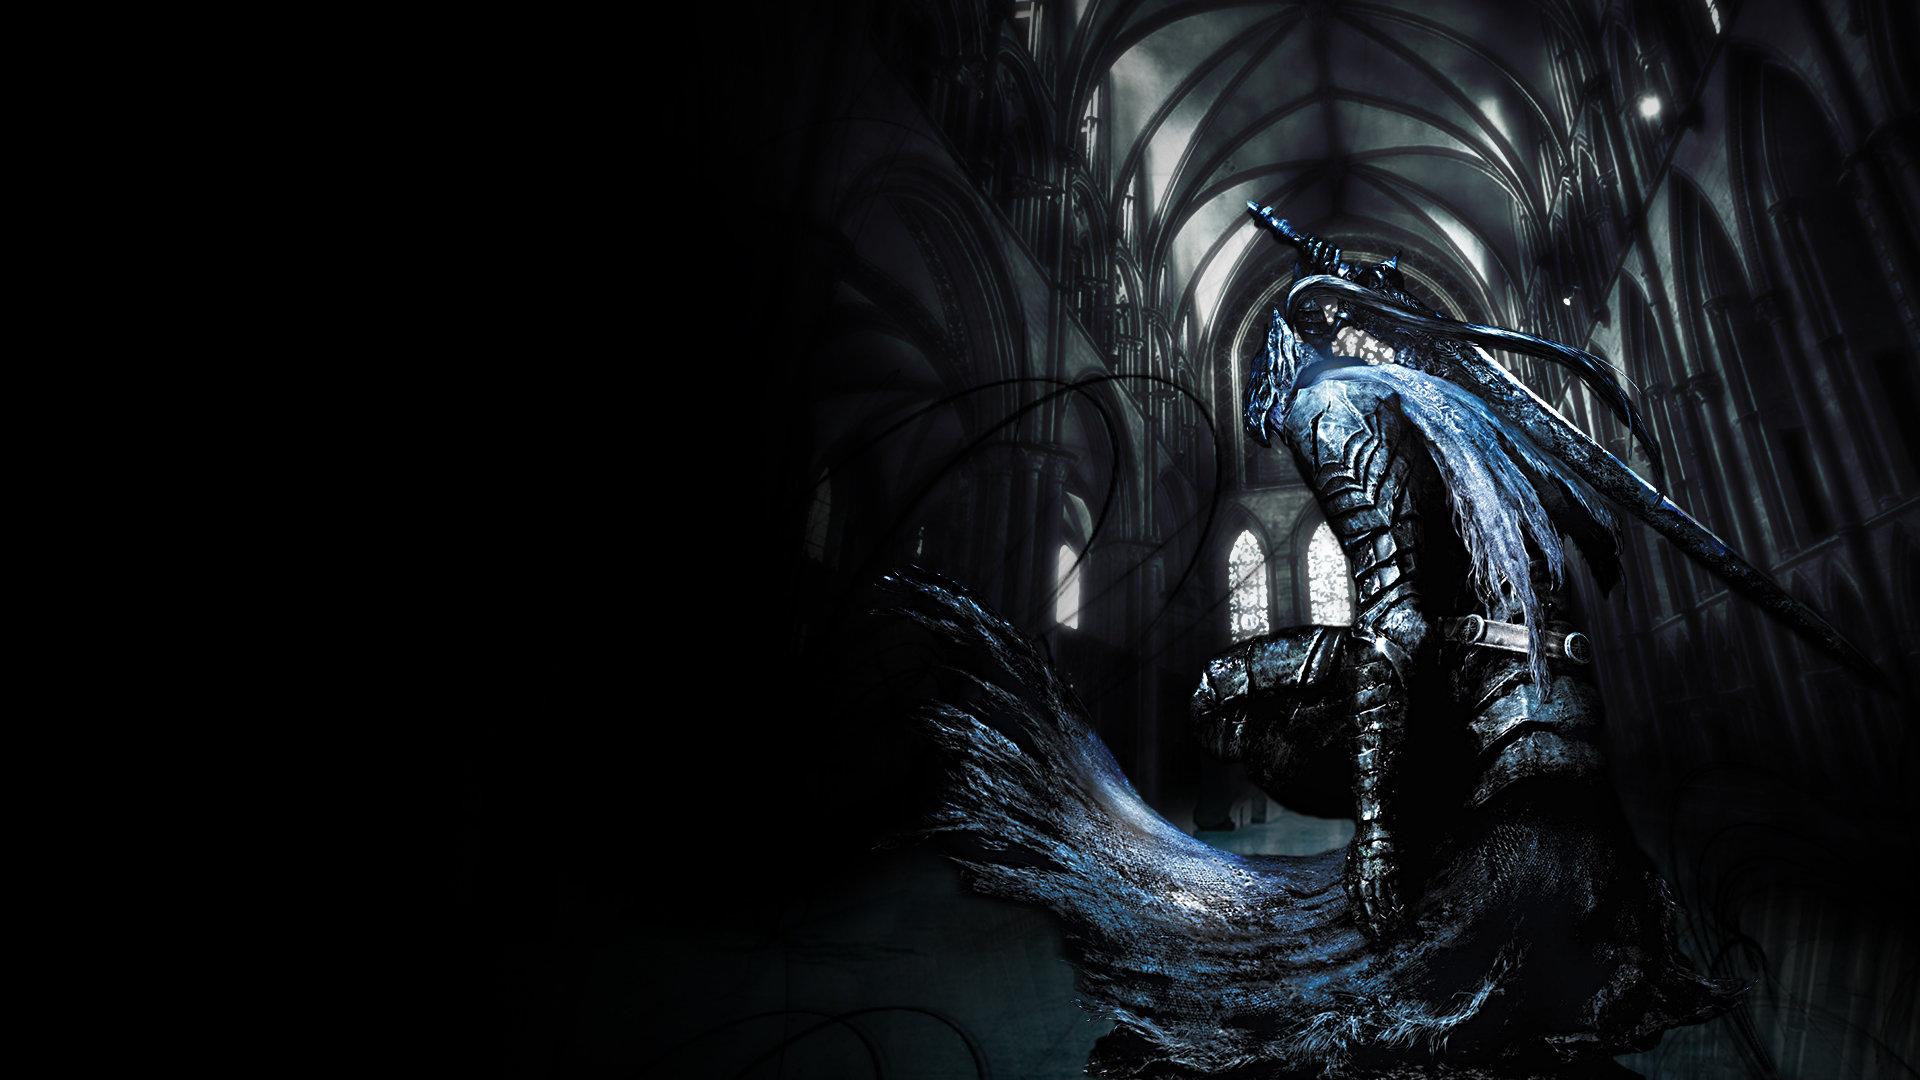 Awesome Artorias Dark Souls Free Wallpaper ID86846 For Full Hd 1080p PC